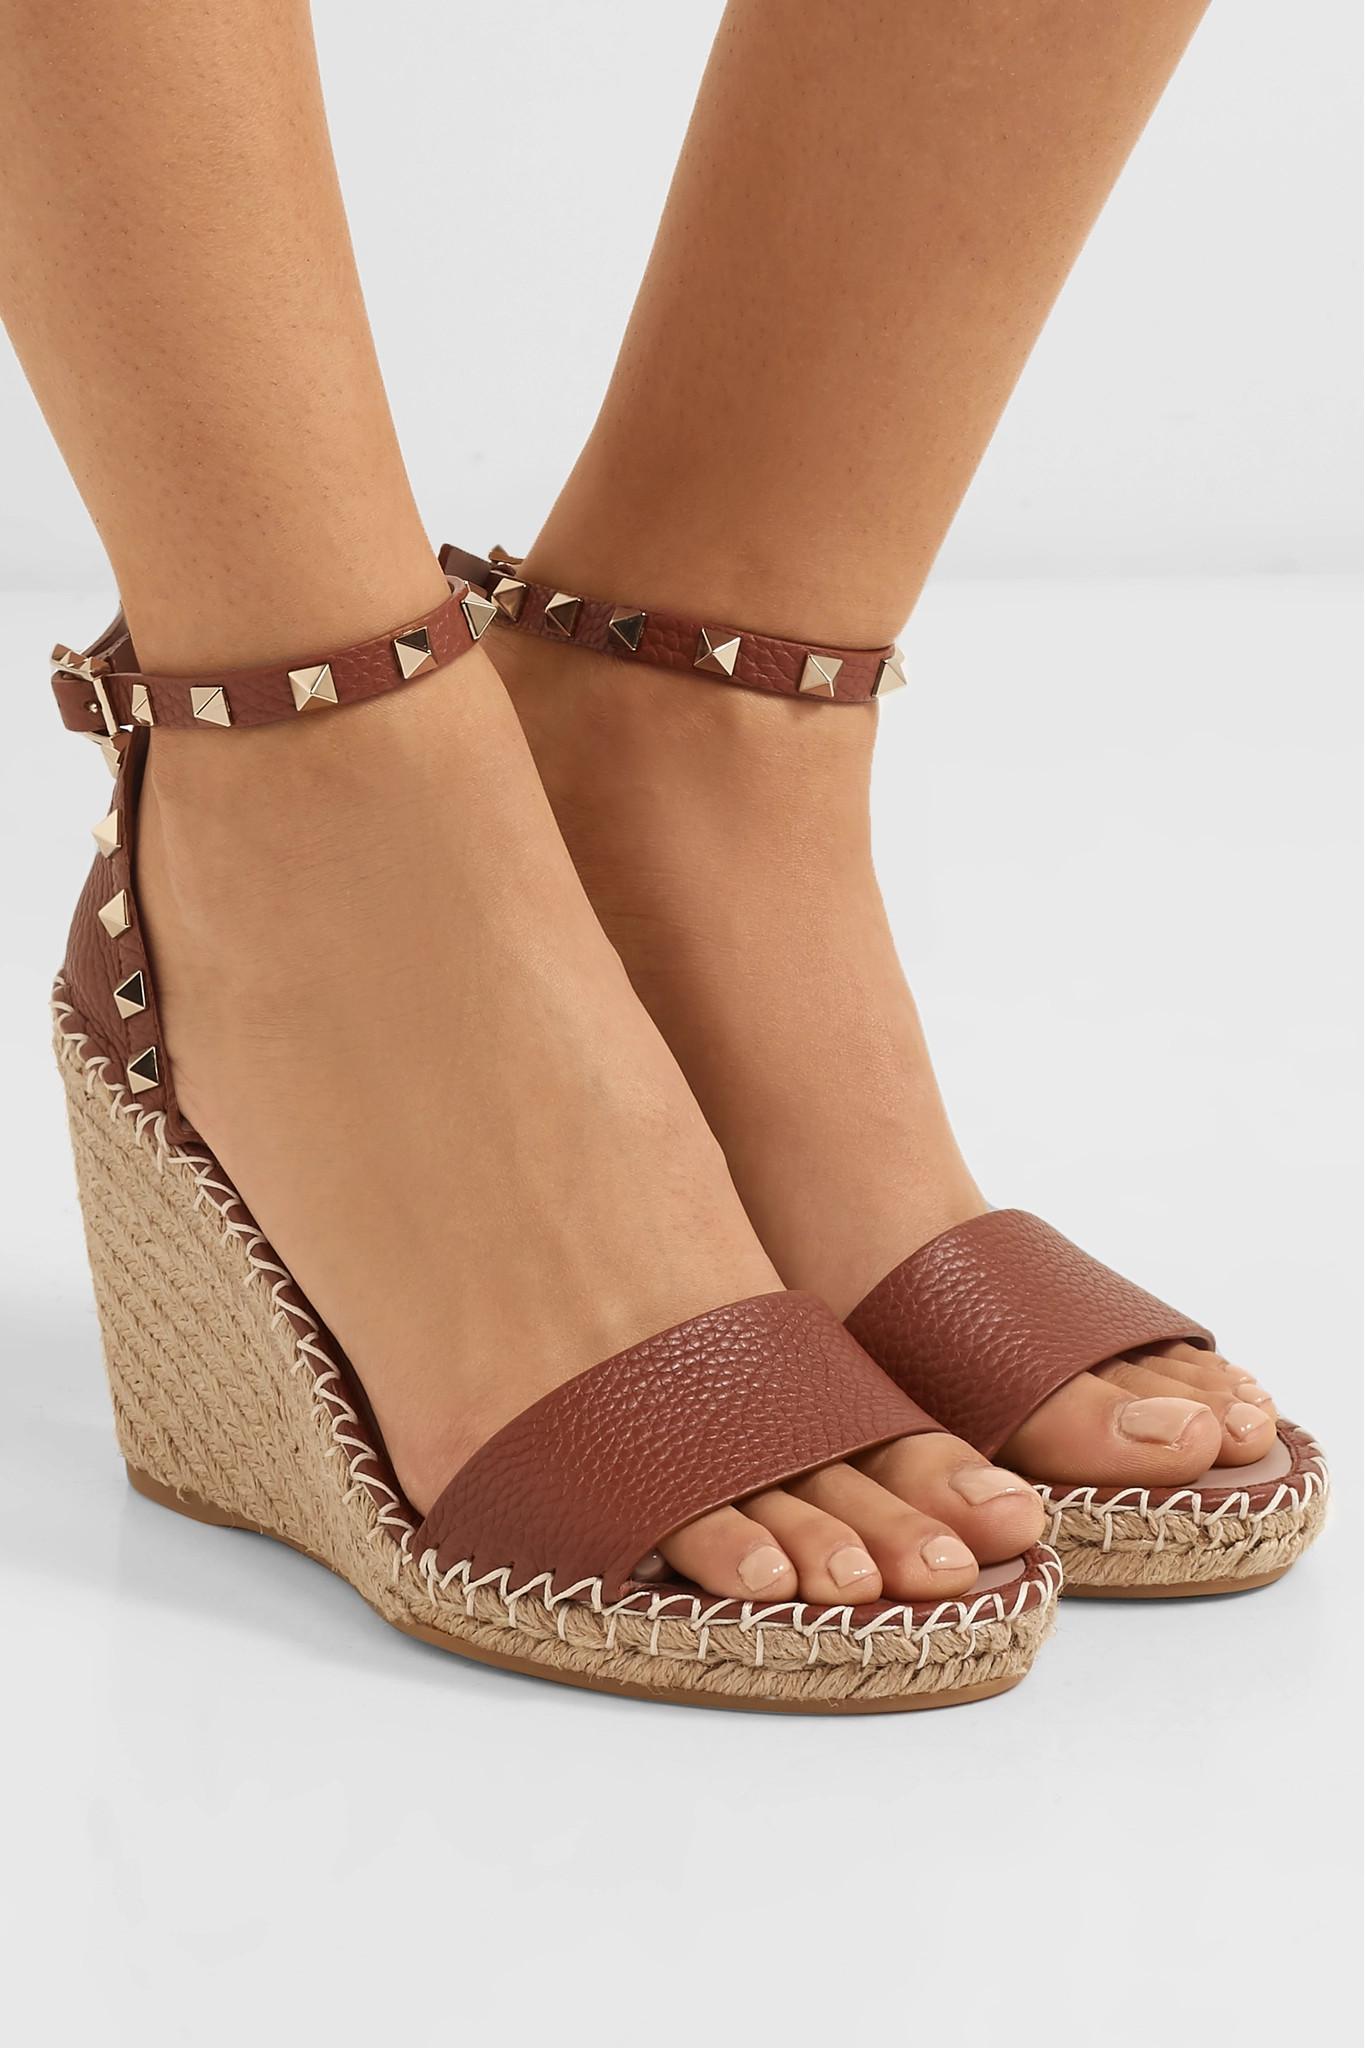 5b270d18f714 Valentino - Brown Garavani The Rockstud Textured-leather Espadrille Wedge  Sandals - Lyst. View fullscreen